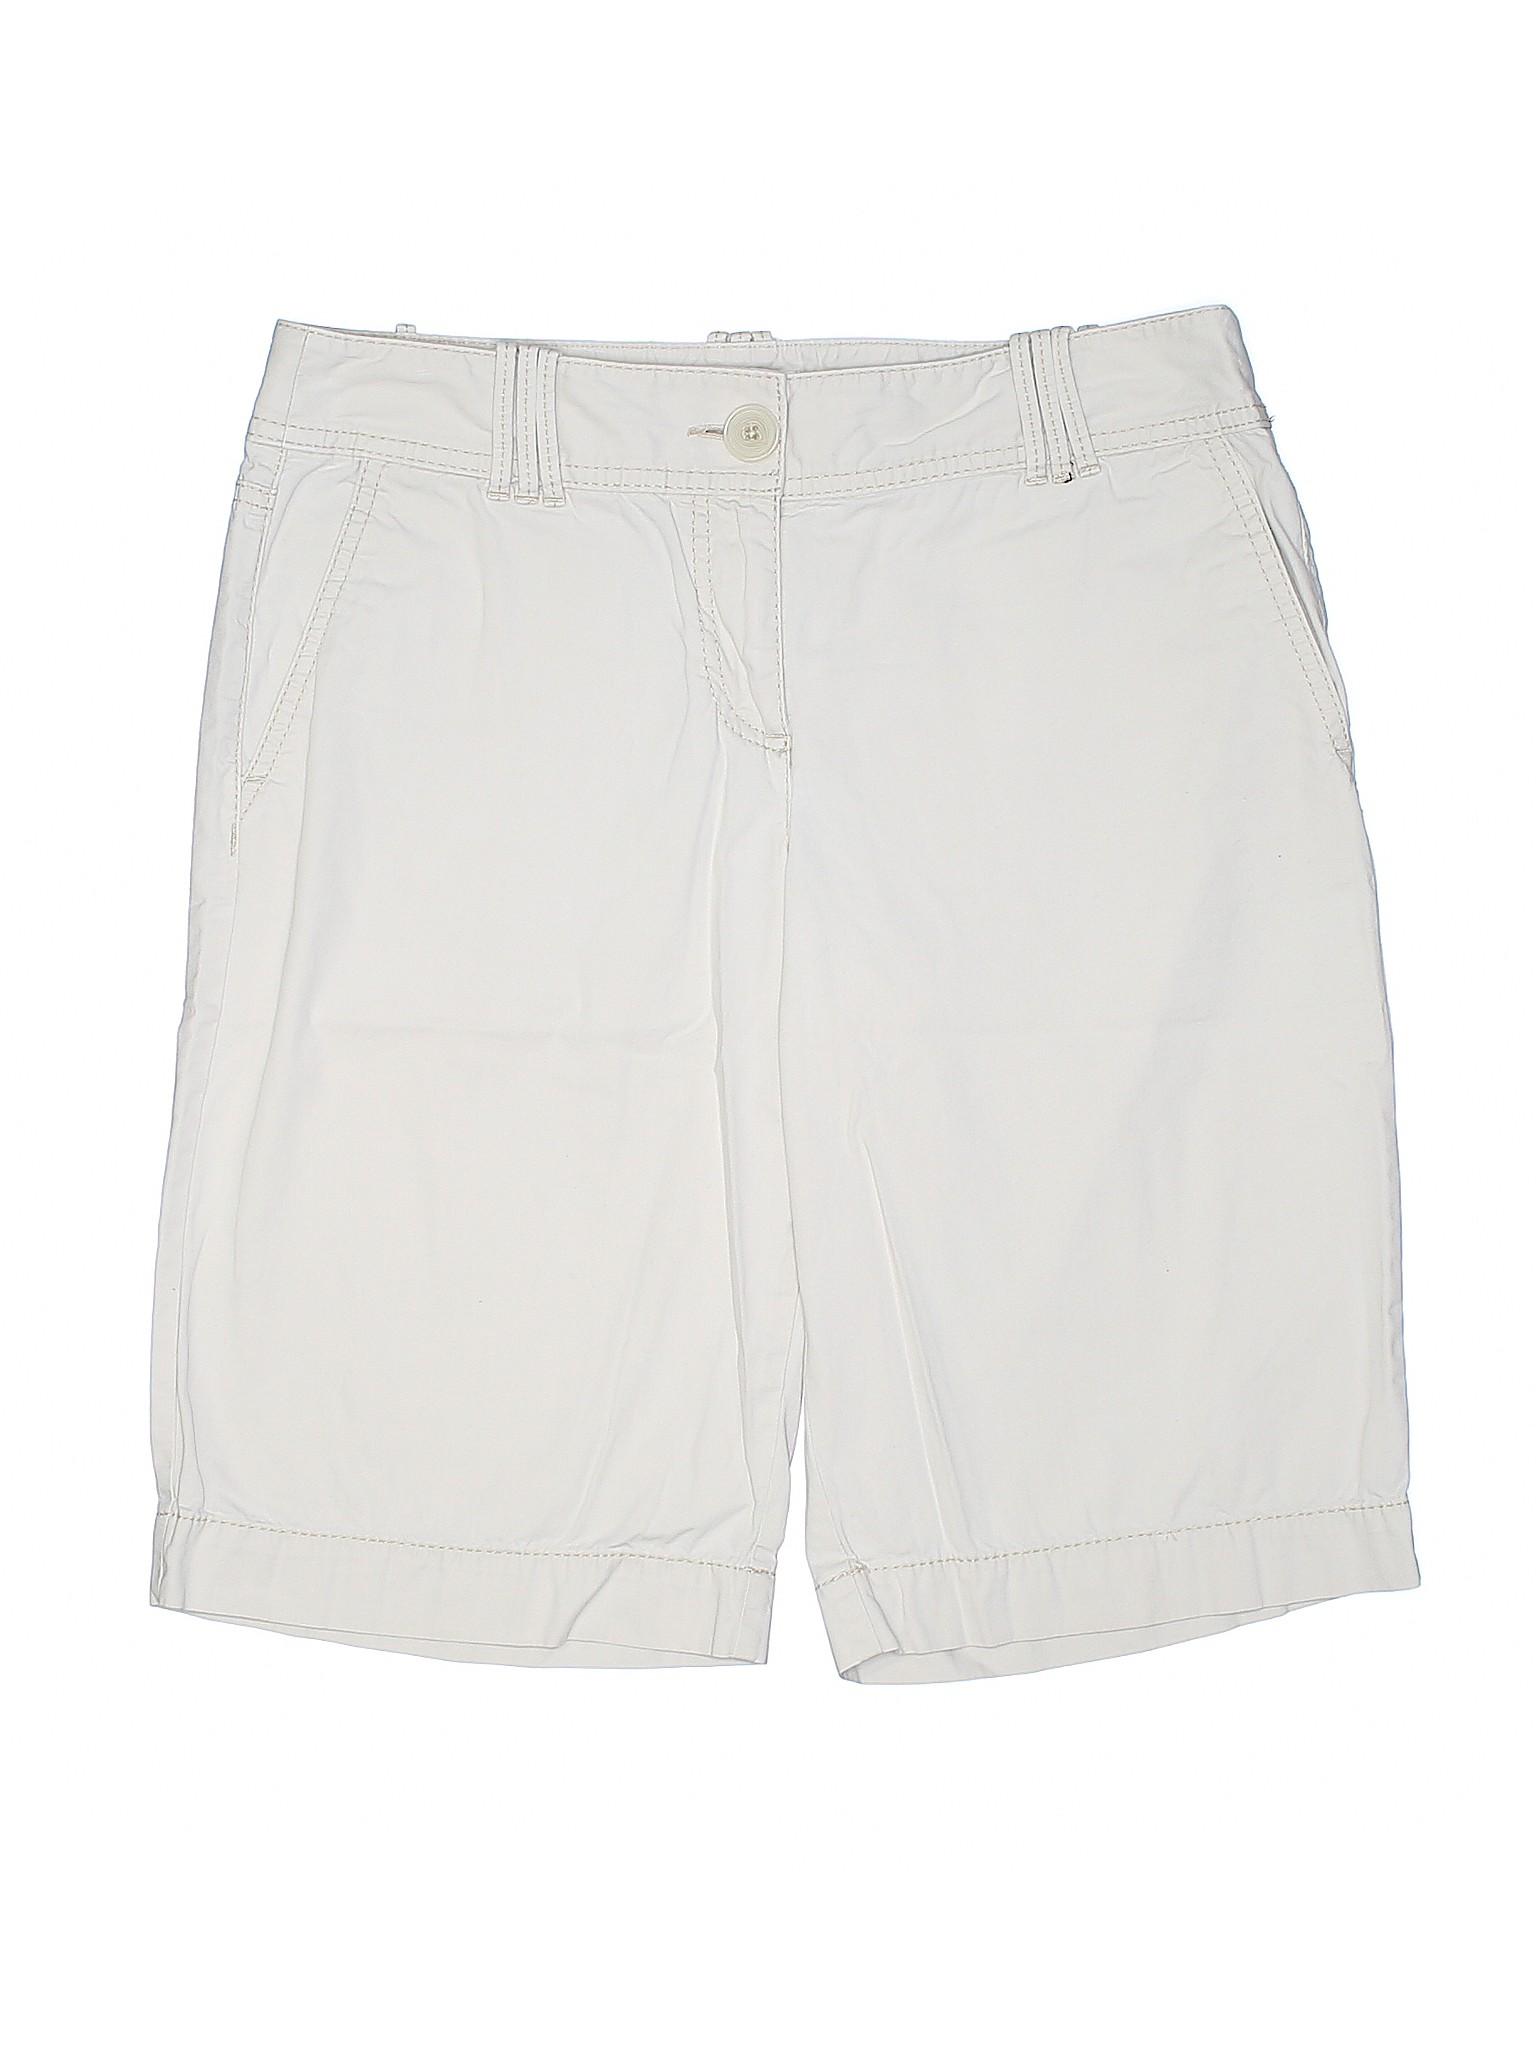 Ann winter Shorts Taylor LOFT Leisure Khaki WPaAw7nqYY